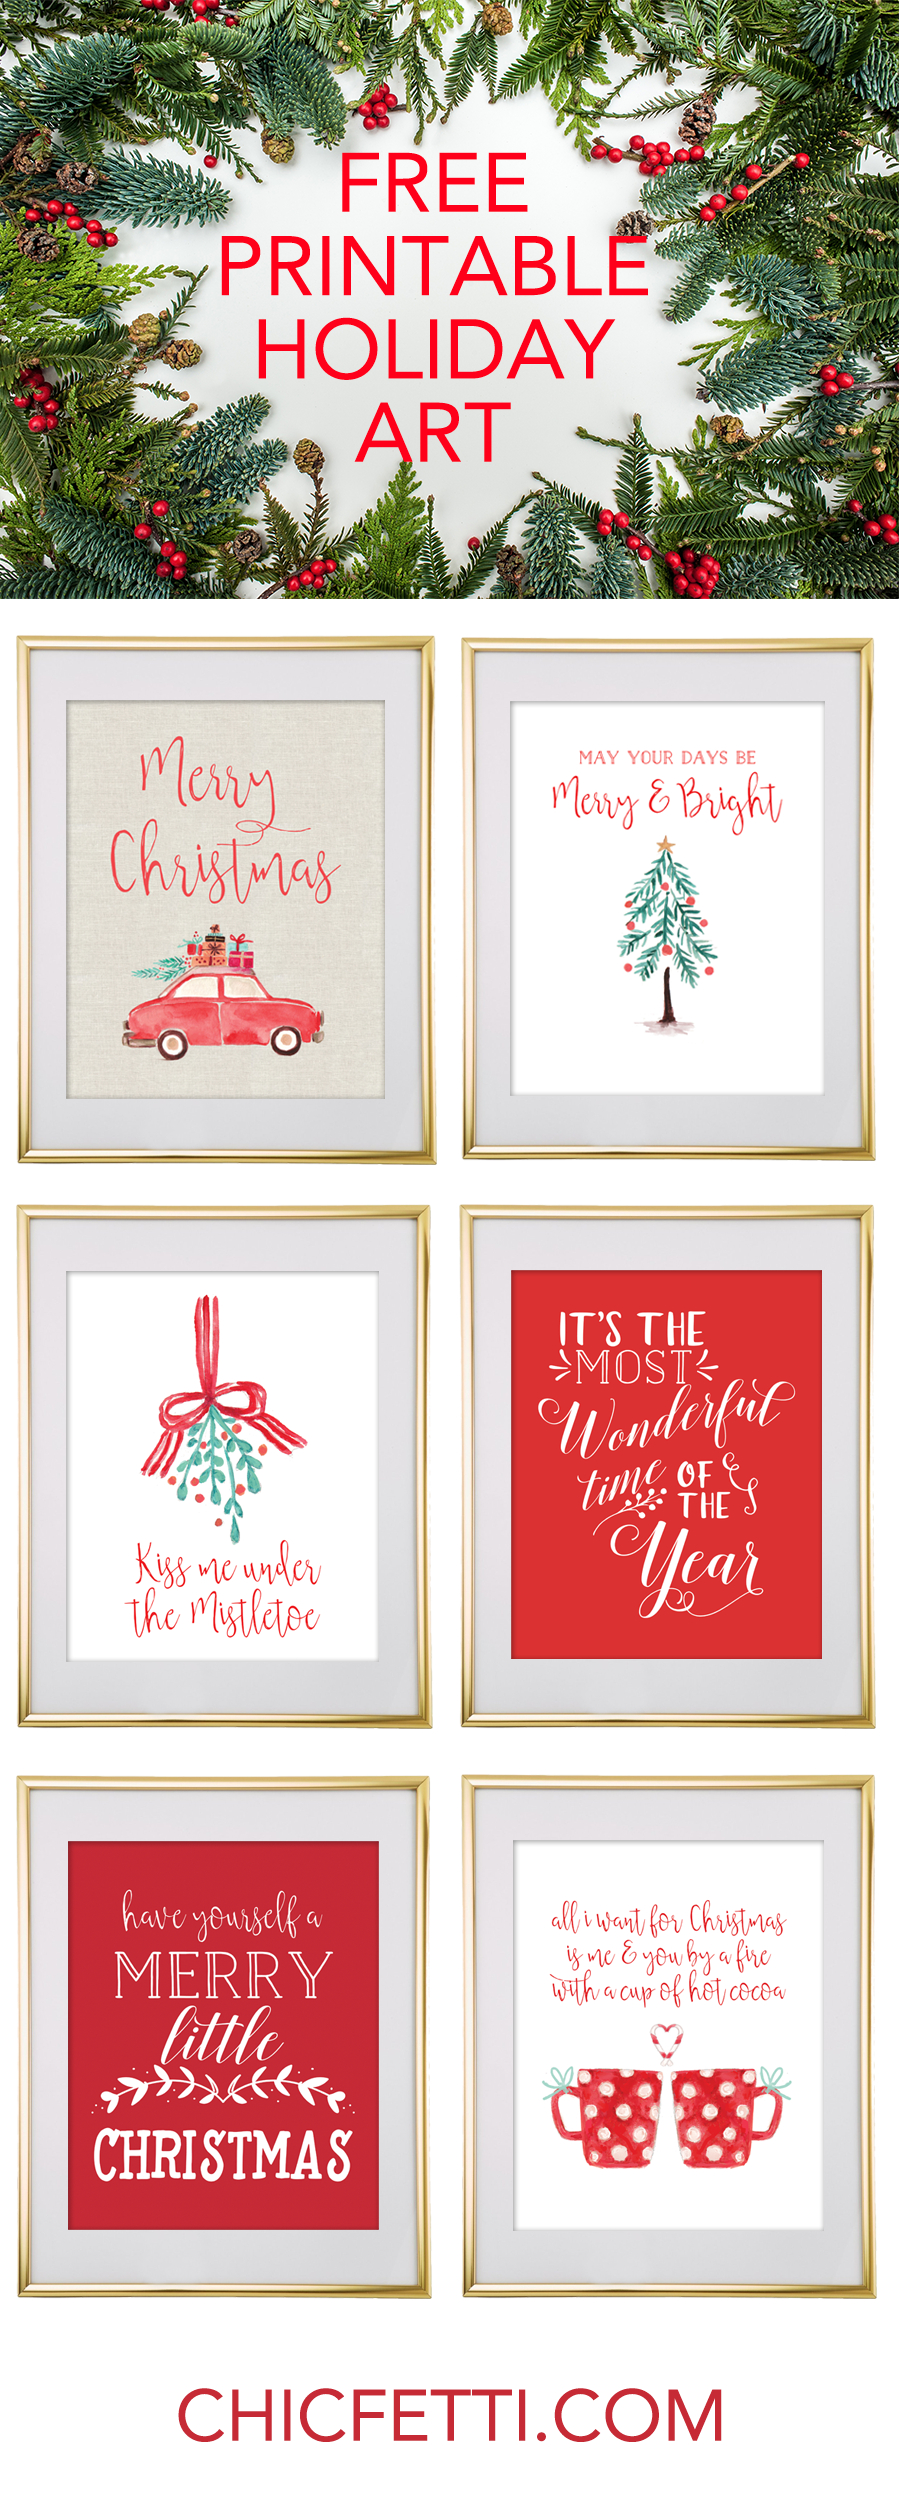 Free Printable Holiday Christmas Wall Art From @chicfetti | Free - Free Printable Christmas Art